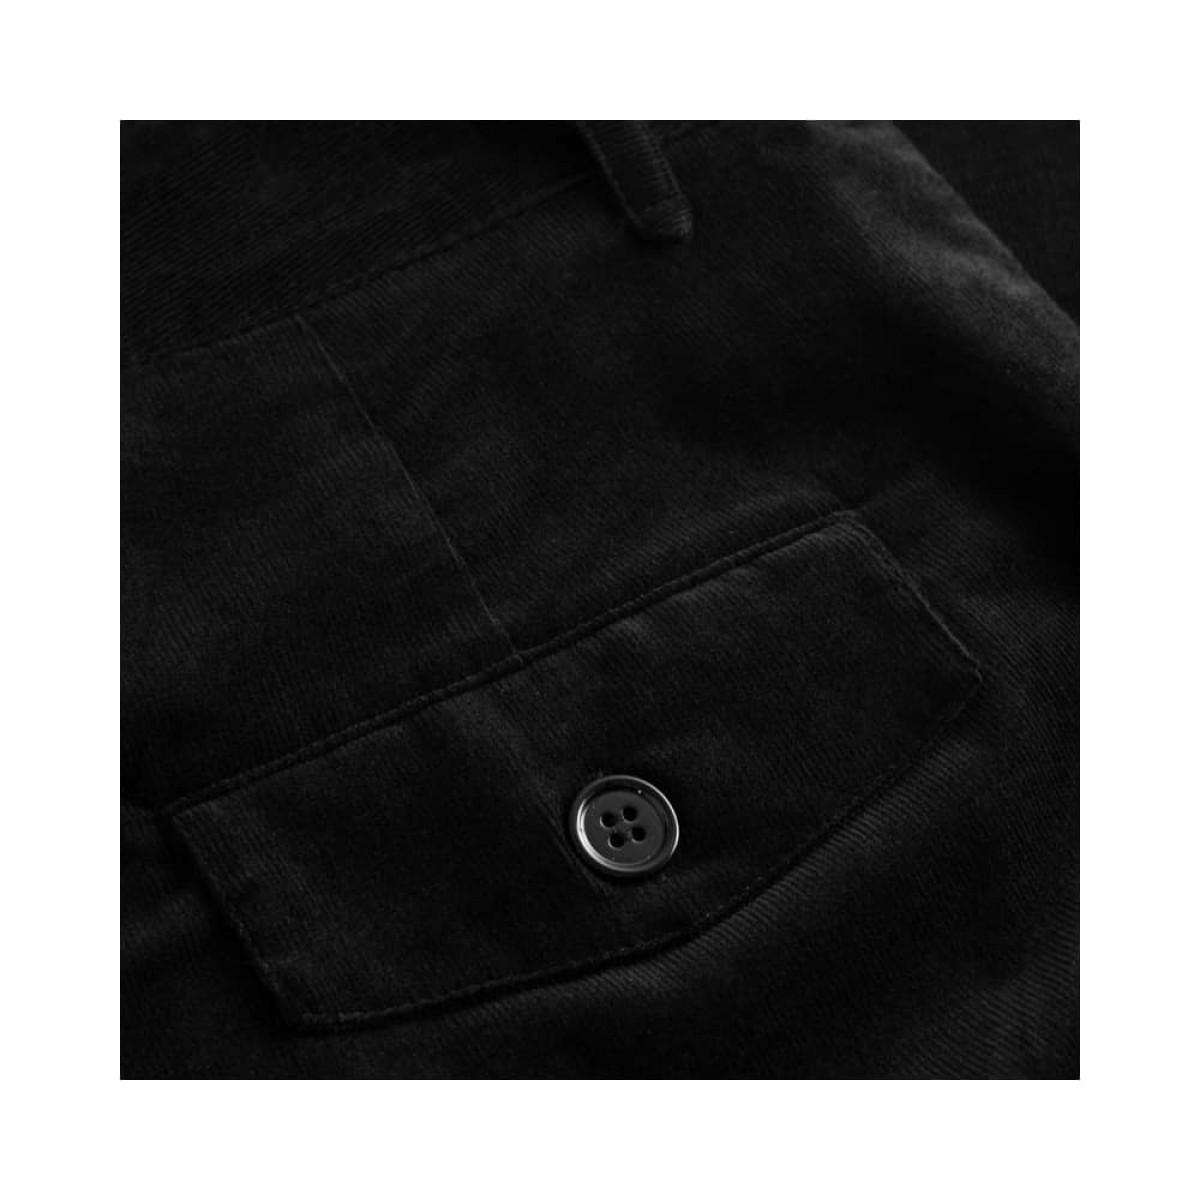 coppola pants - black fløjl - baglomme